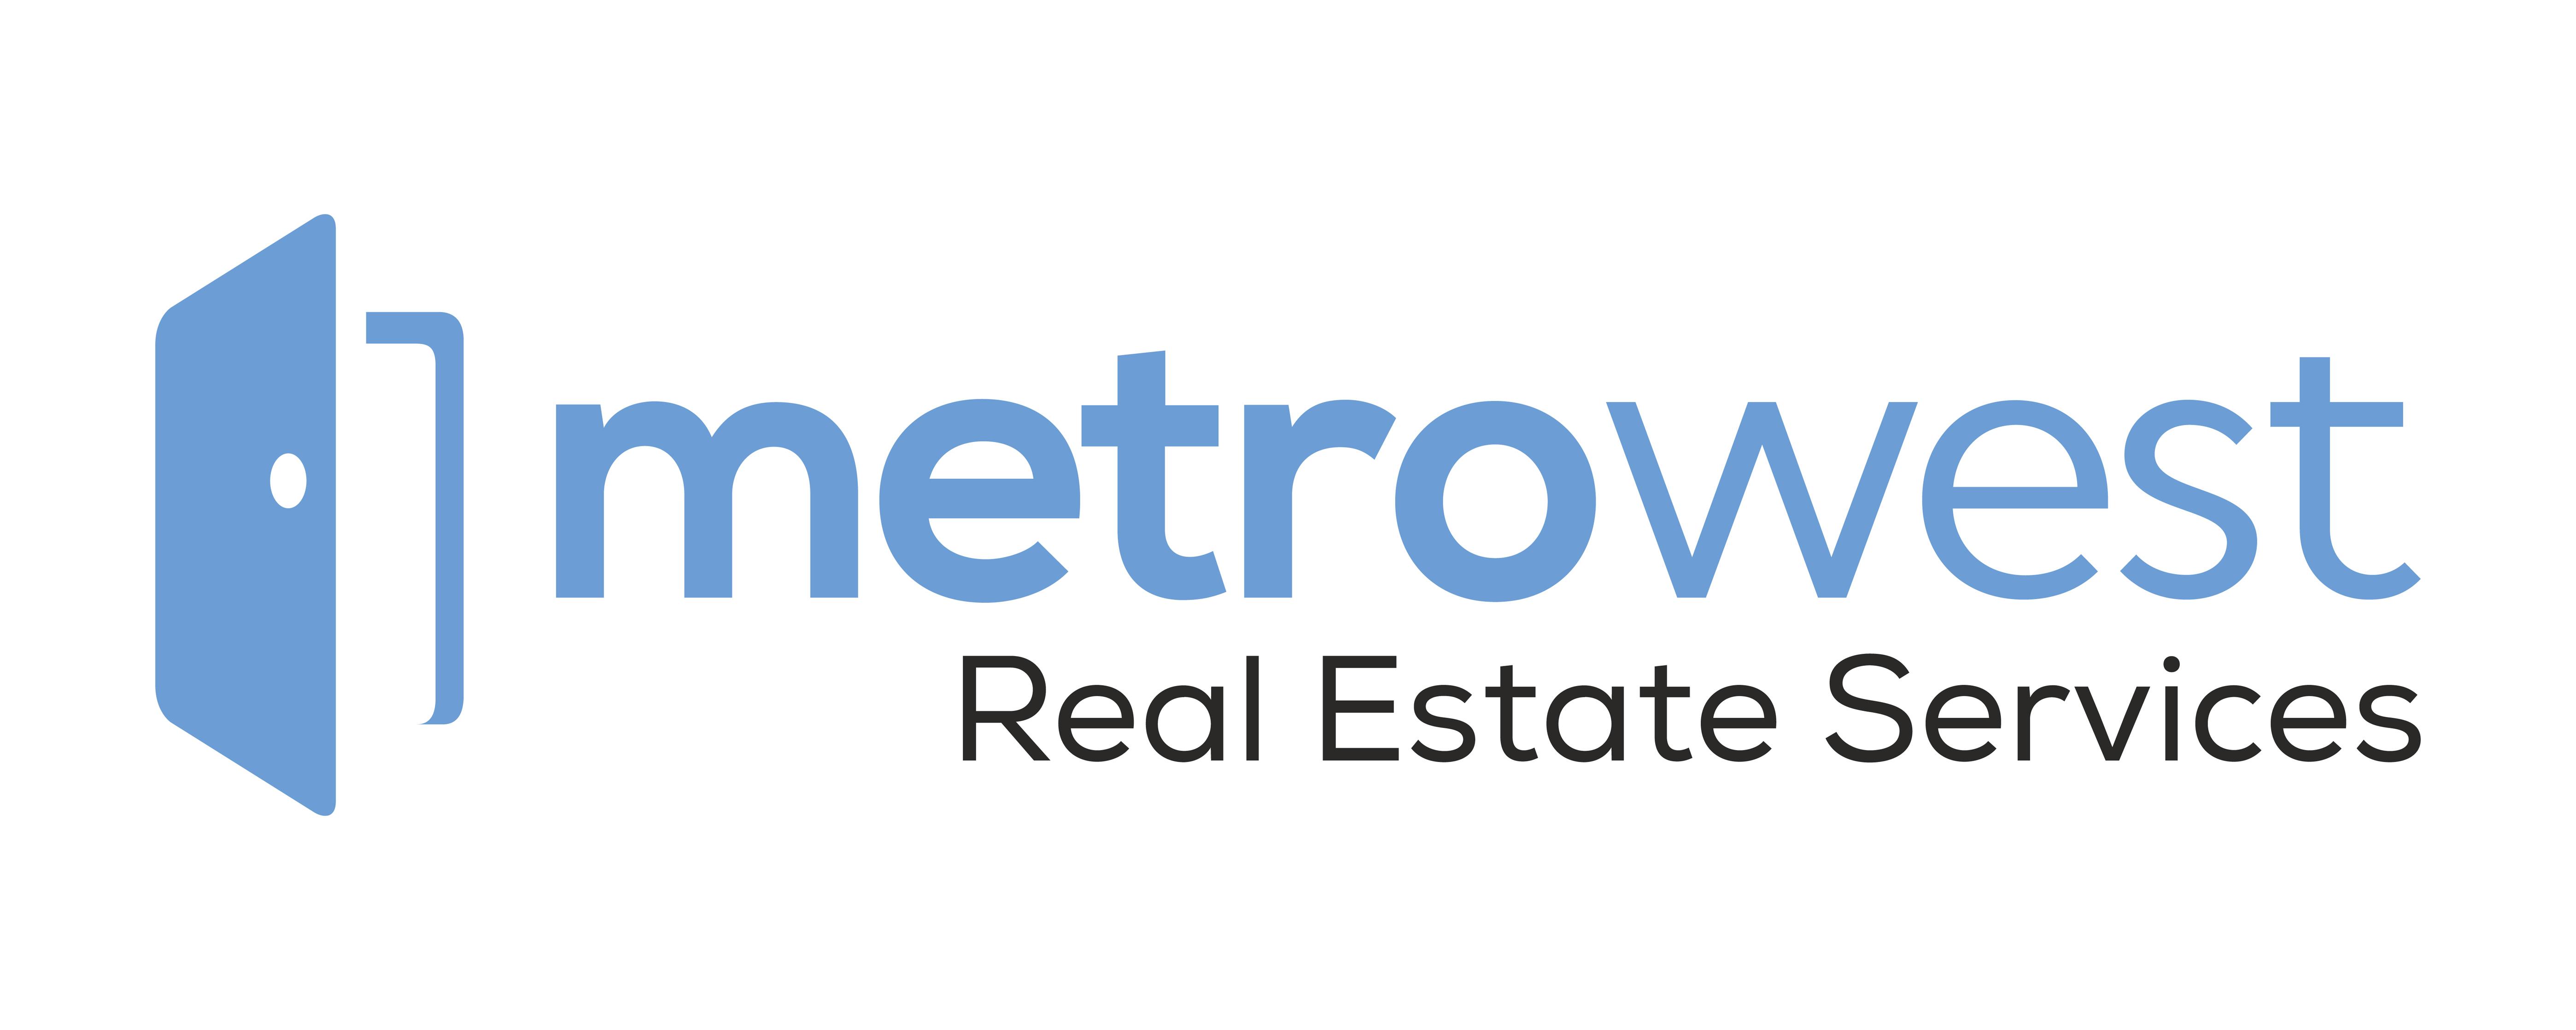 "alt=""Metrowest"